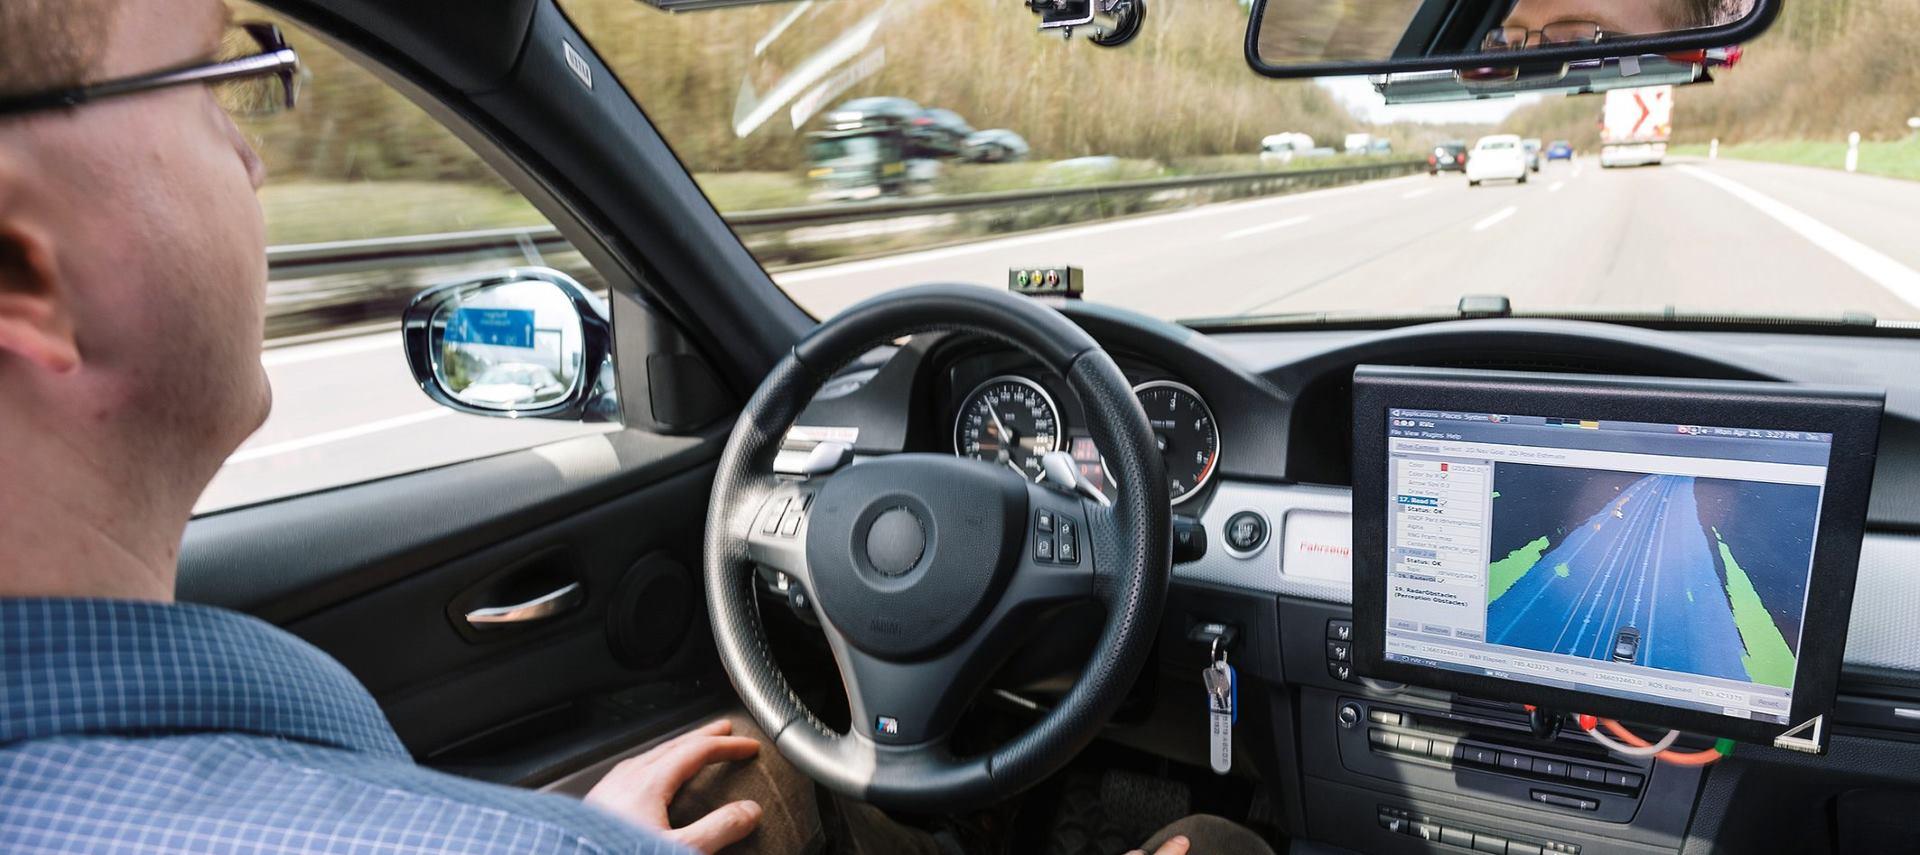 BOSCH CONNECTEDWORLD 2017 Predstavljeno integrirano računalo za automatizirana vozila